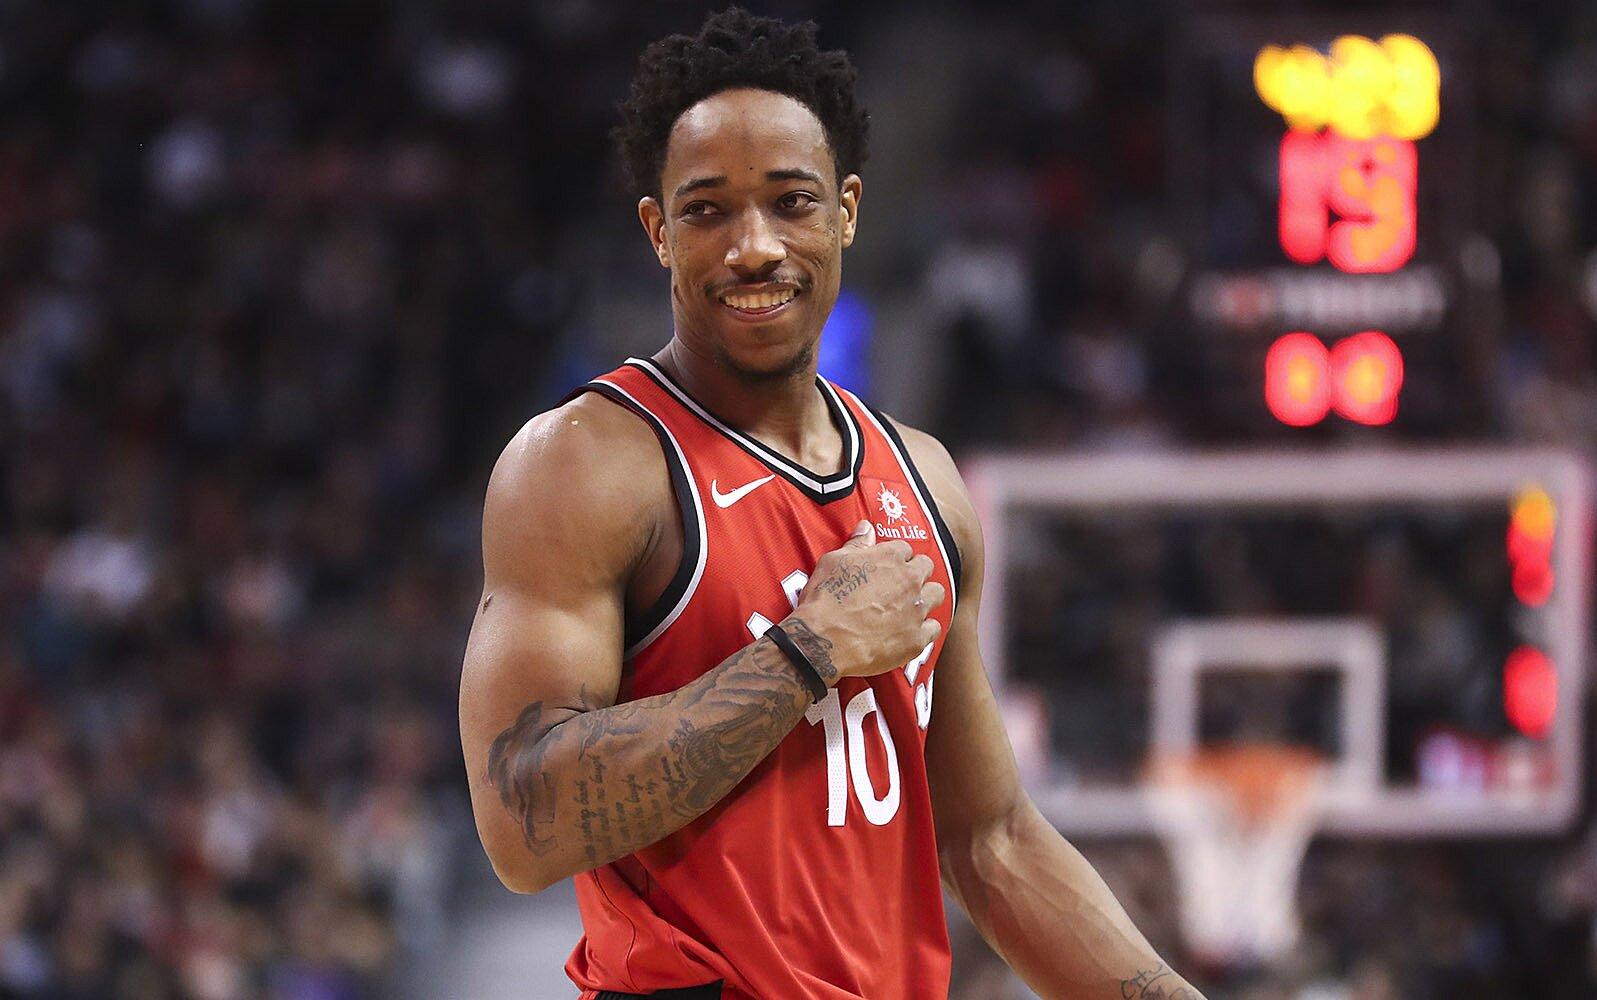 All-NBA Teams: LeBron, Harden Headline SI's 2018 Picks | SI com